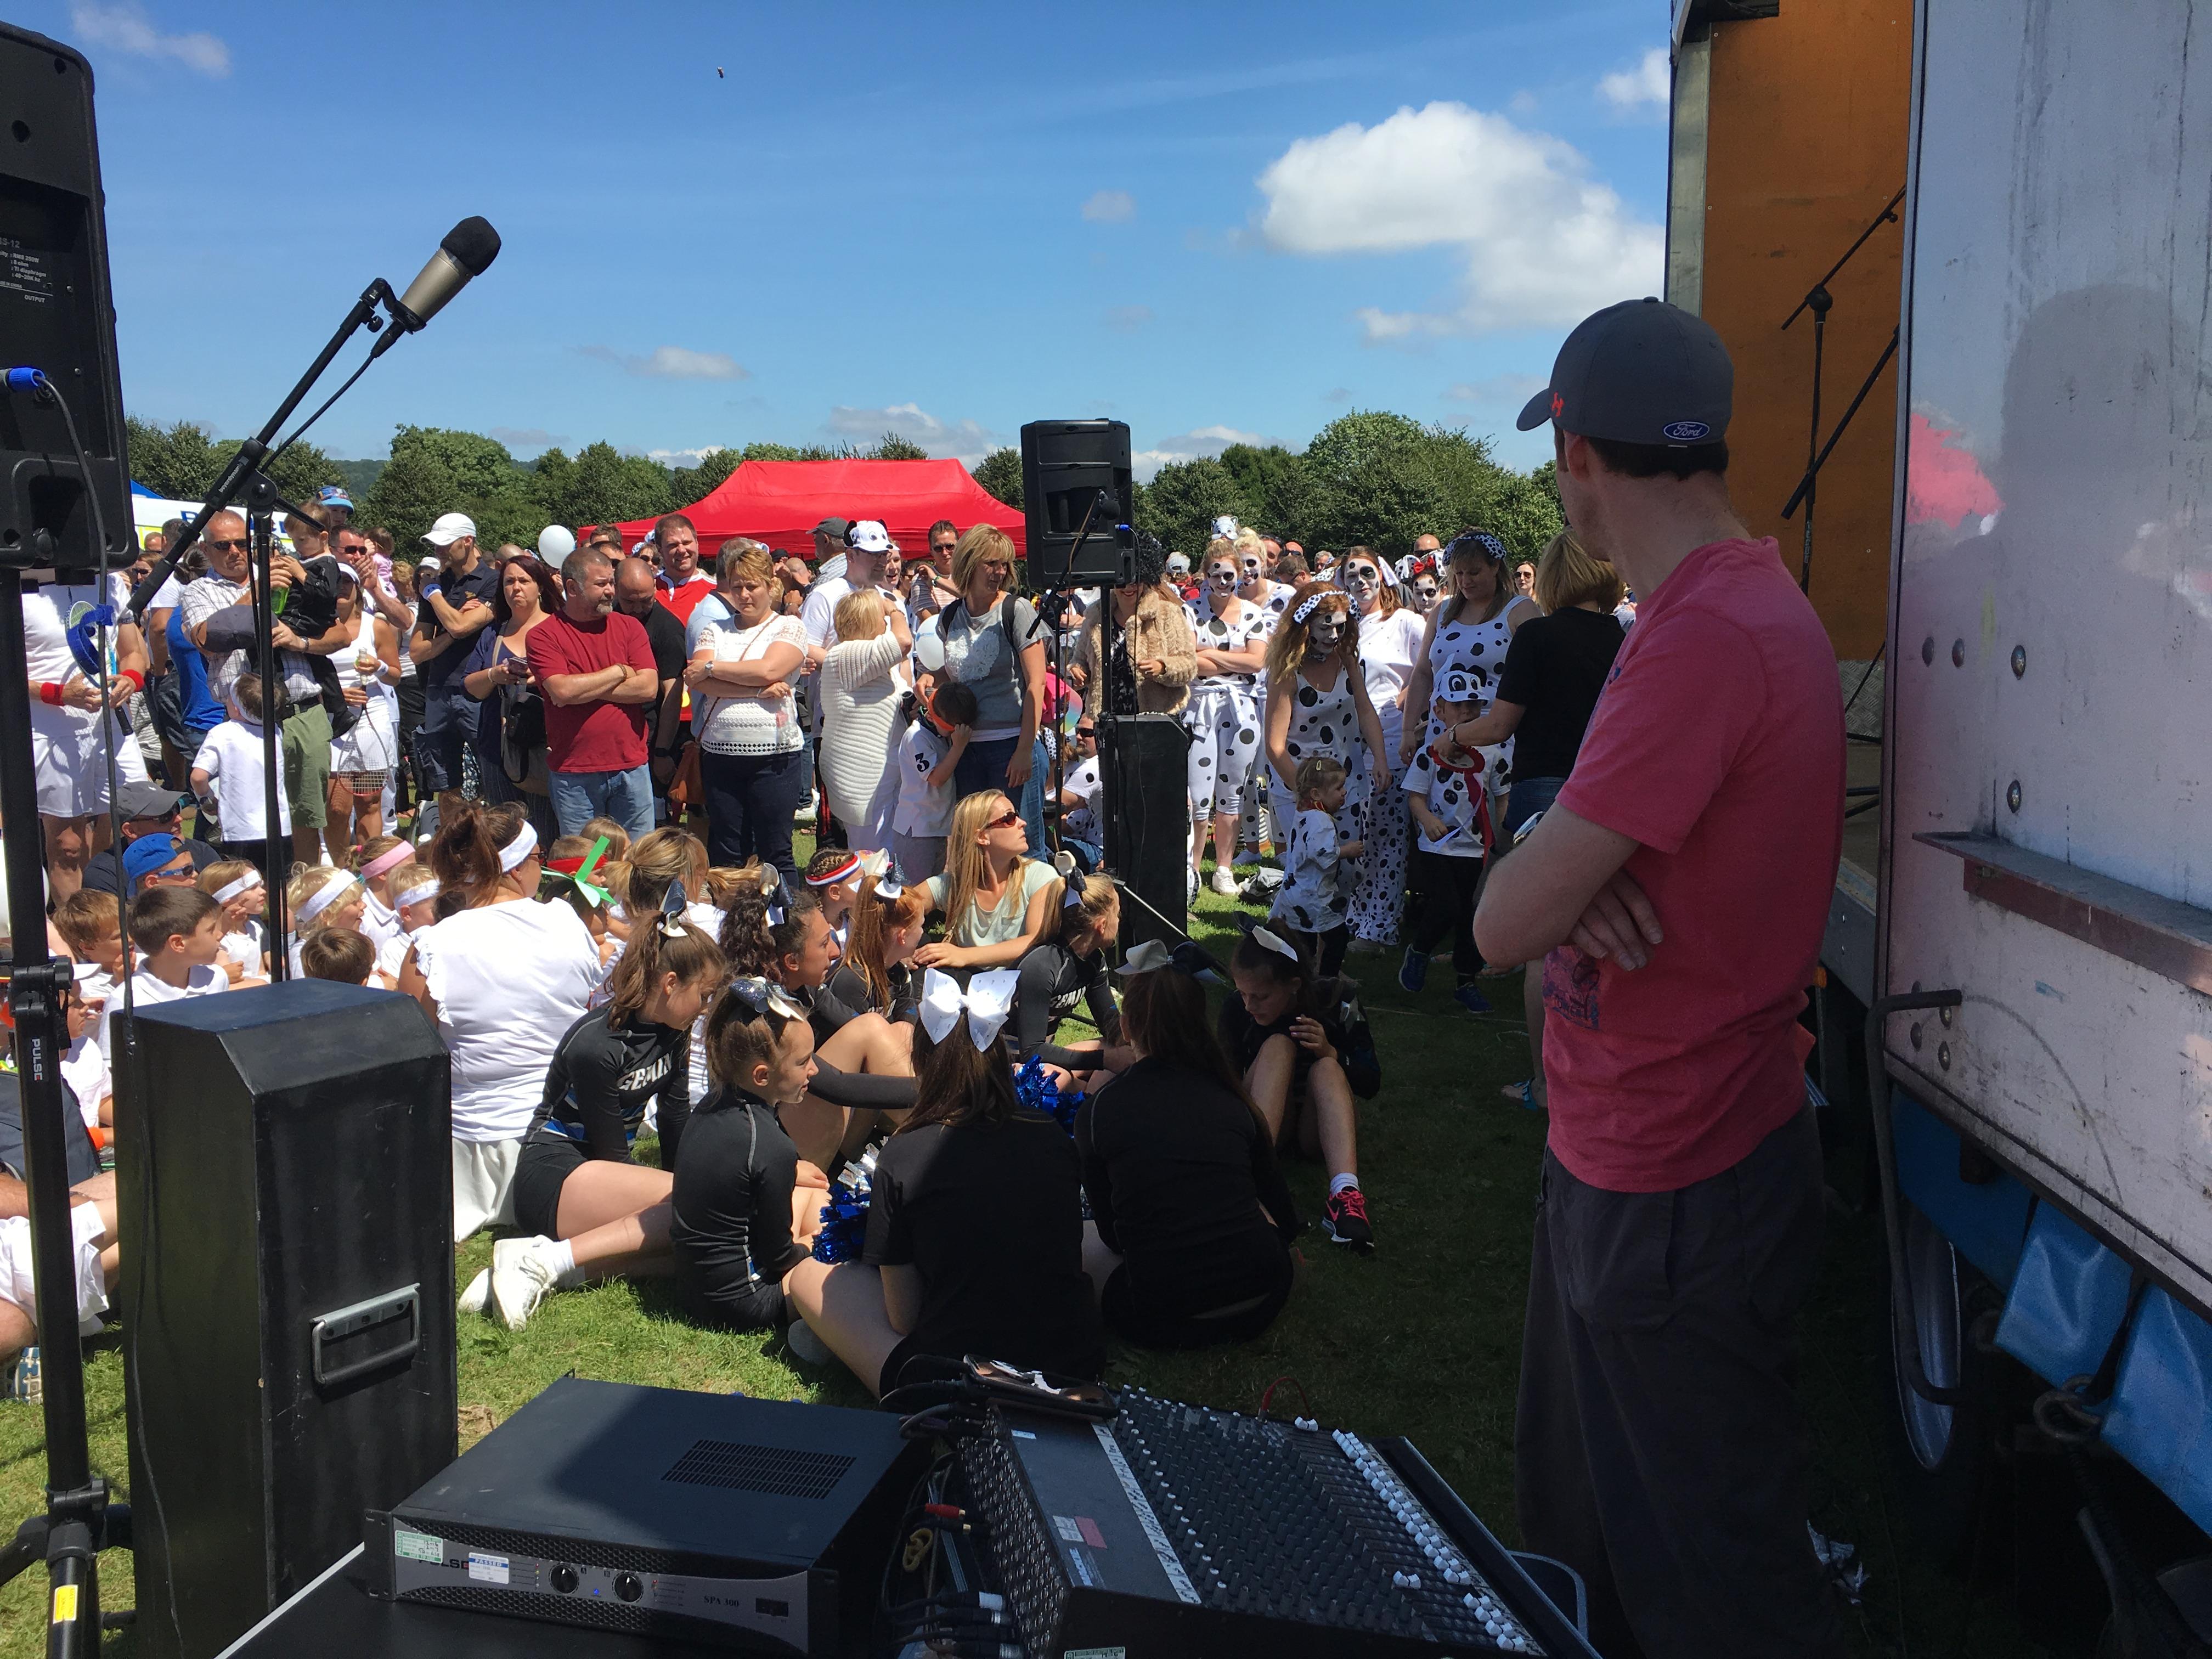 Nailsea Carnival fair 2017